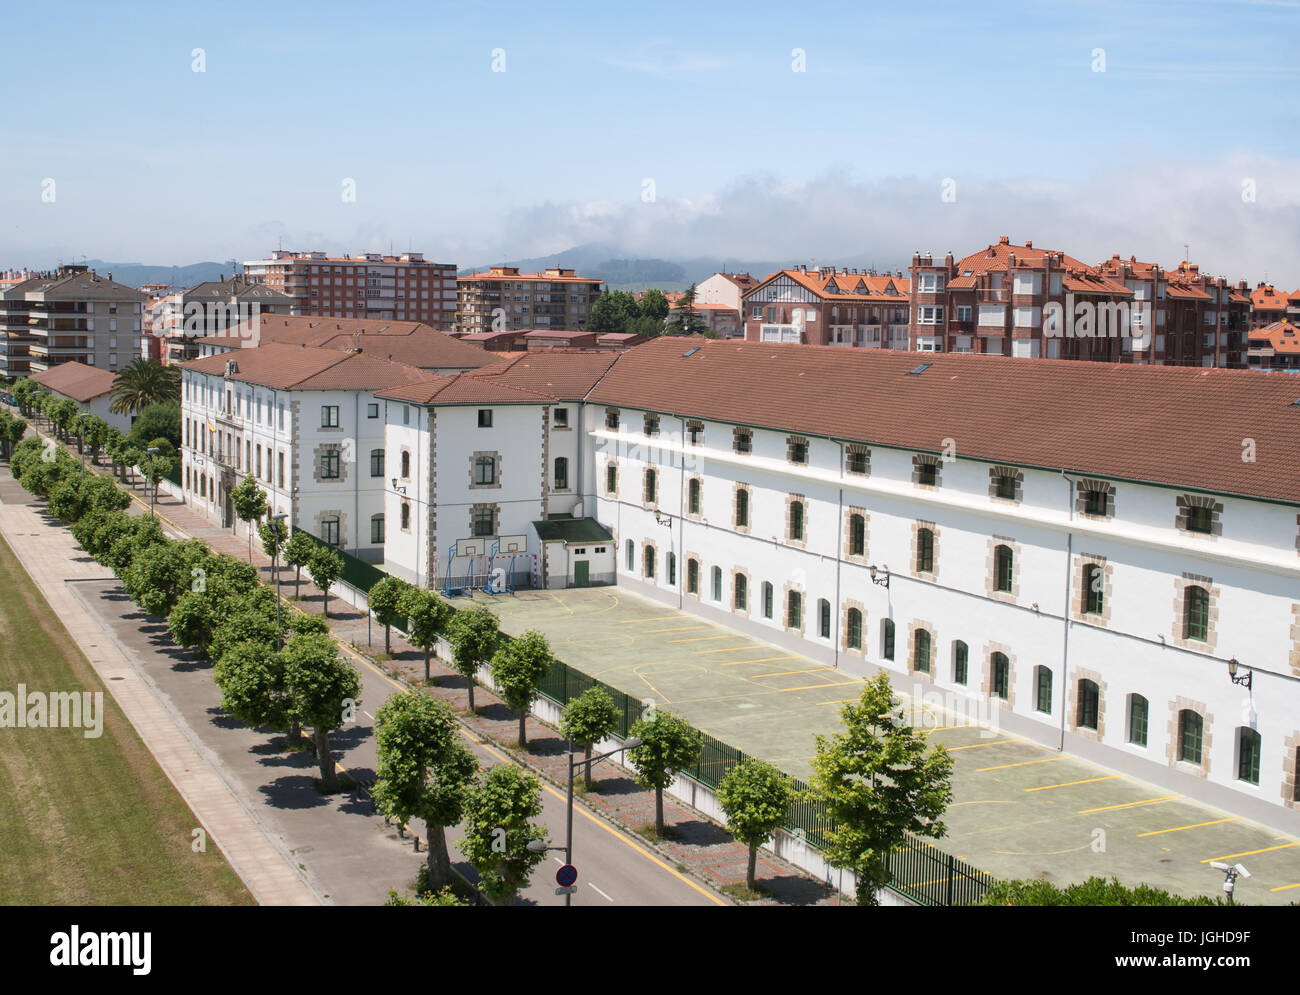 Military academy or Academia militar en Santoña, Cantabria, Spain - Stock Image